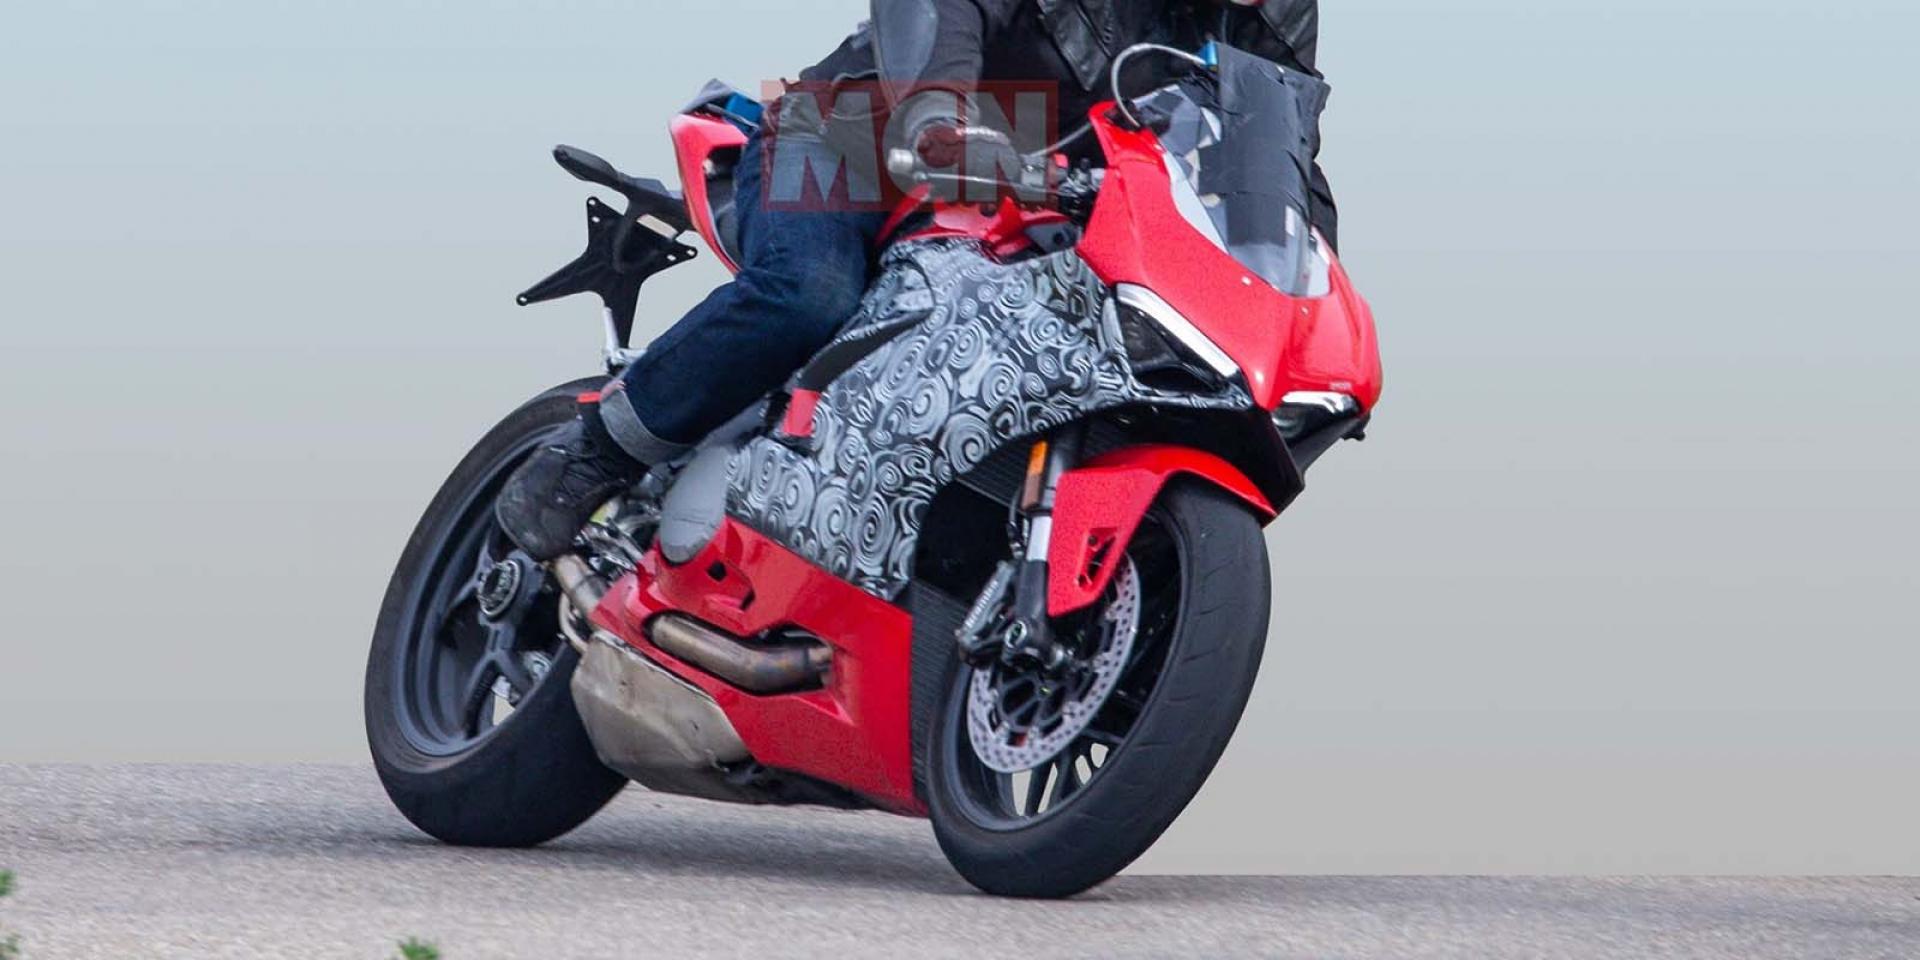 L-twin仿賽即將更新!Ducati 959 Panigale測試車海外捕獲